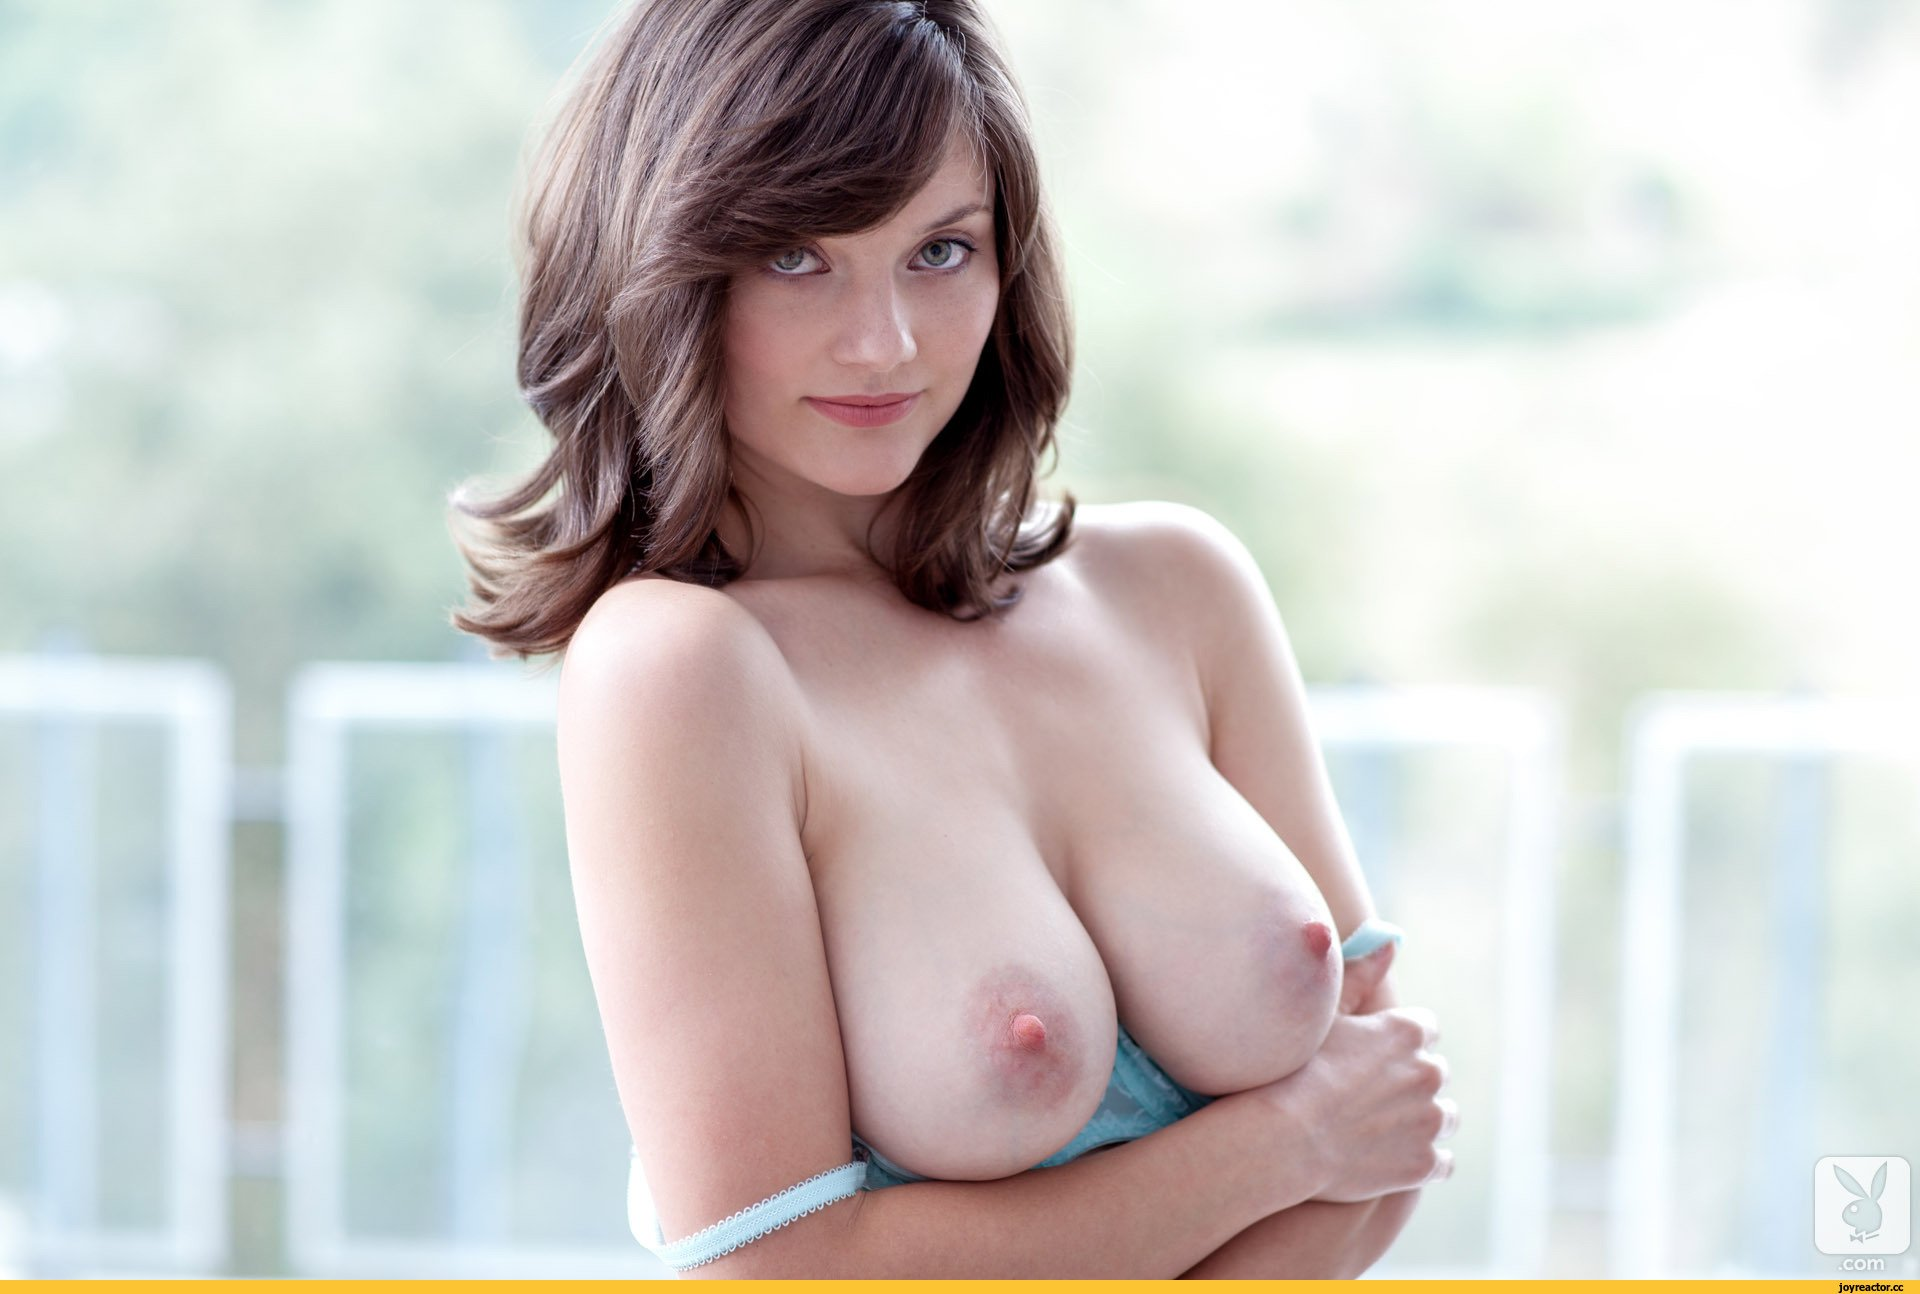 Beautiful Natural Nude Breasts